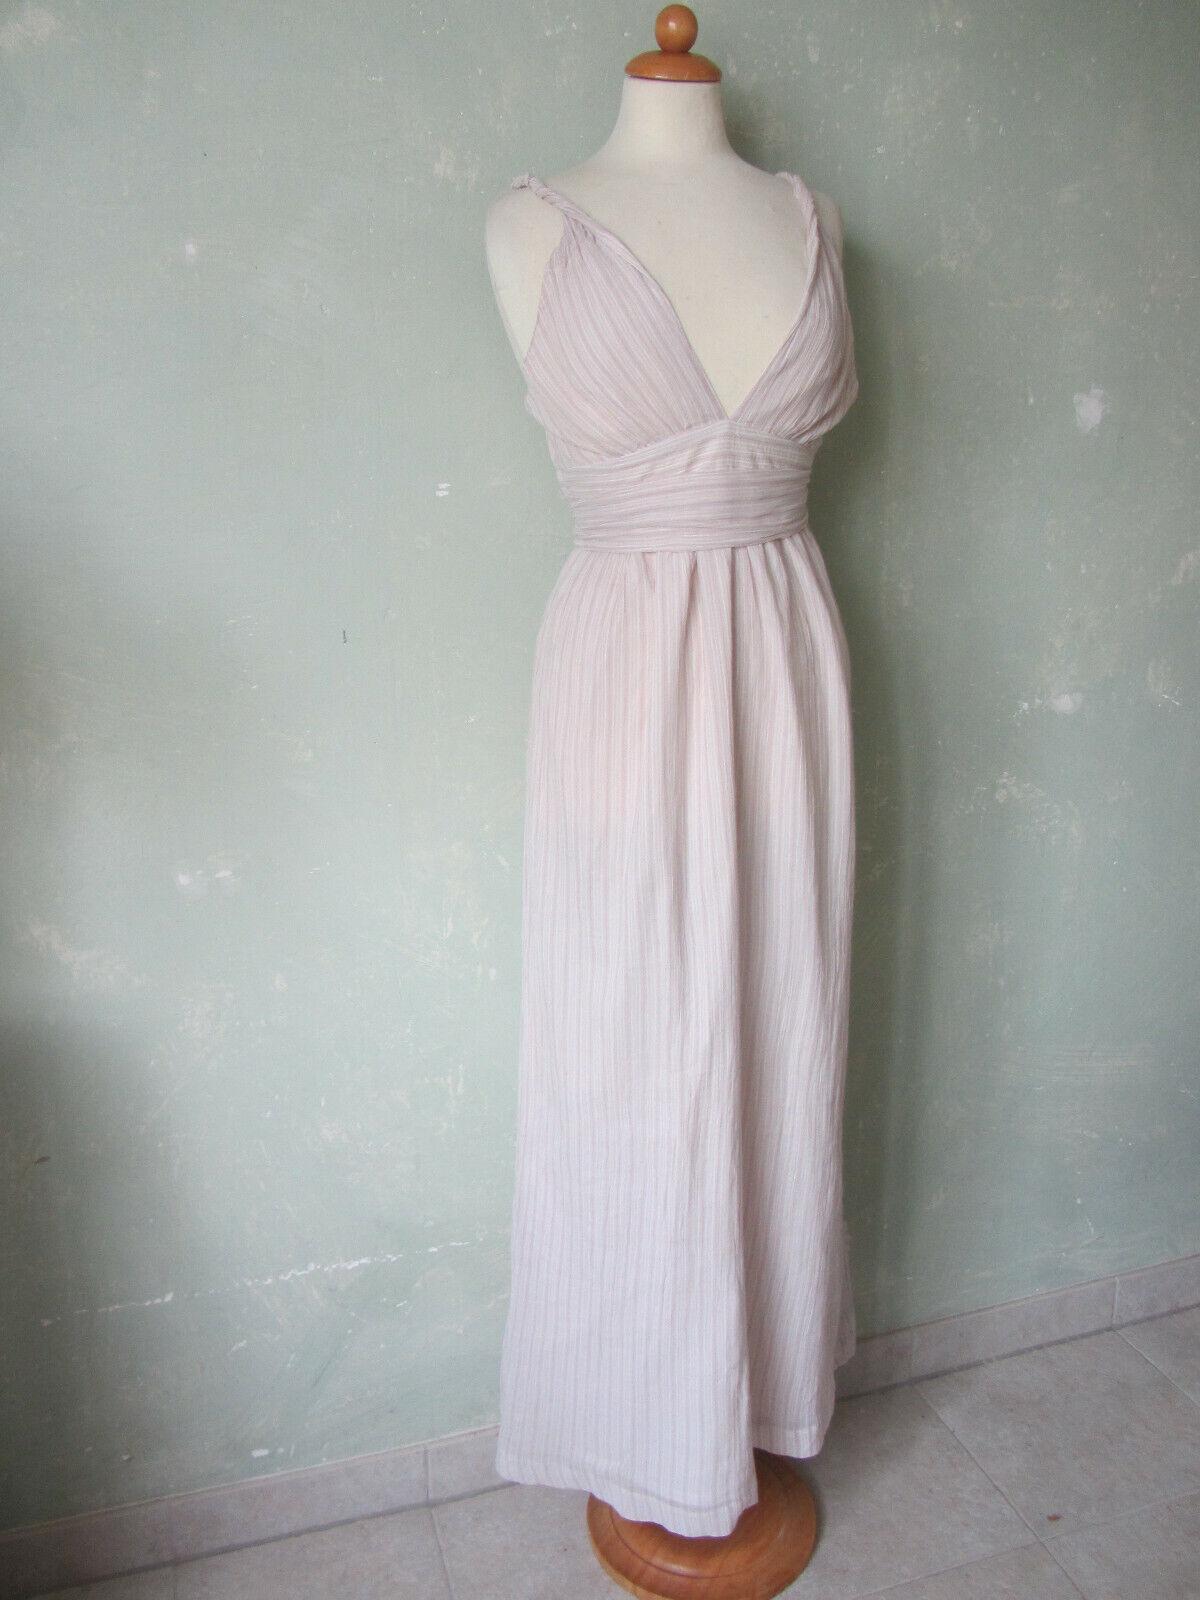 Gap Dress Long Beige Brown Summer Dress Back Neckline Size 38 M